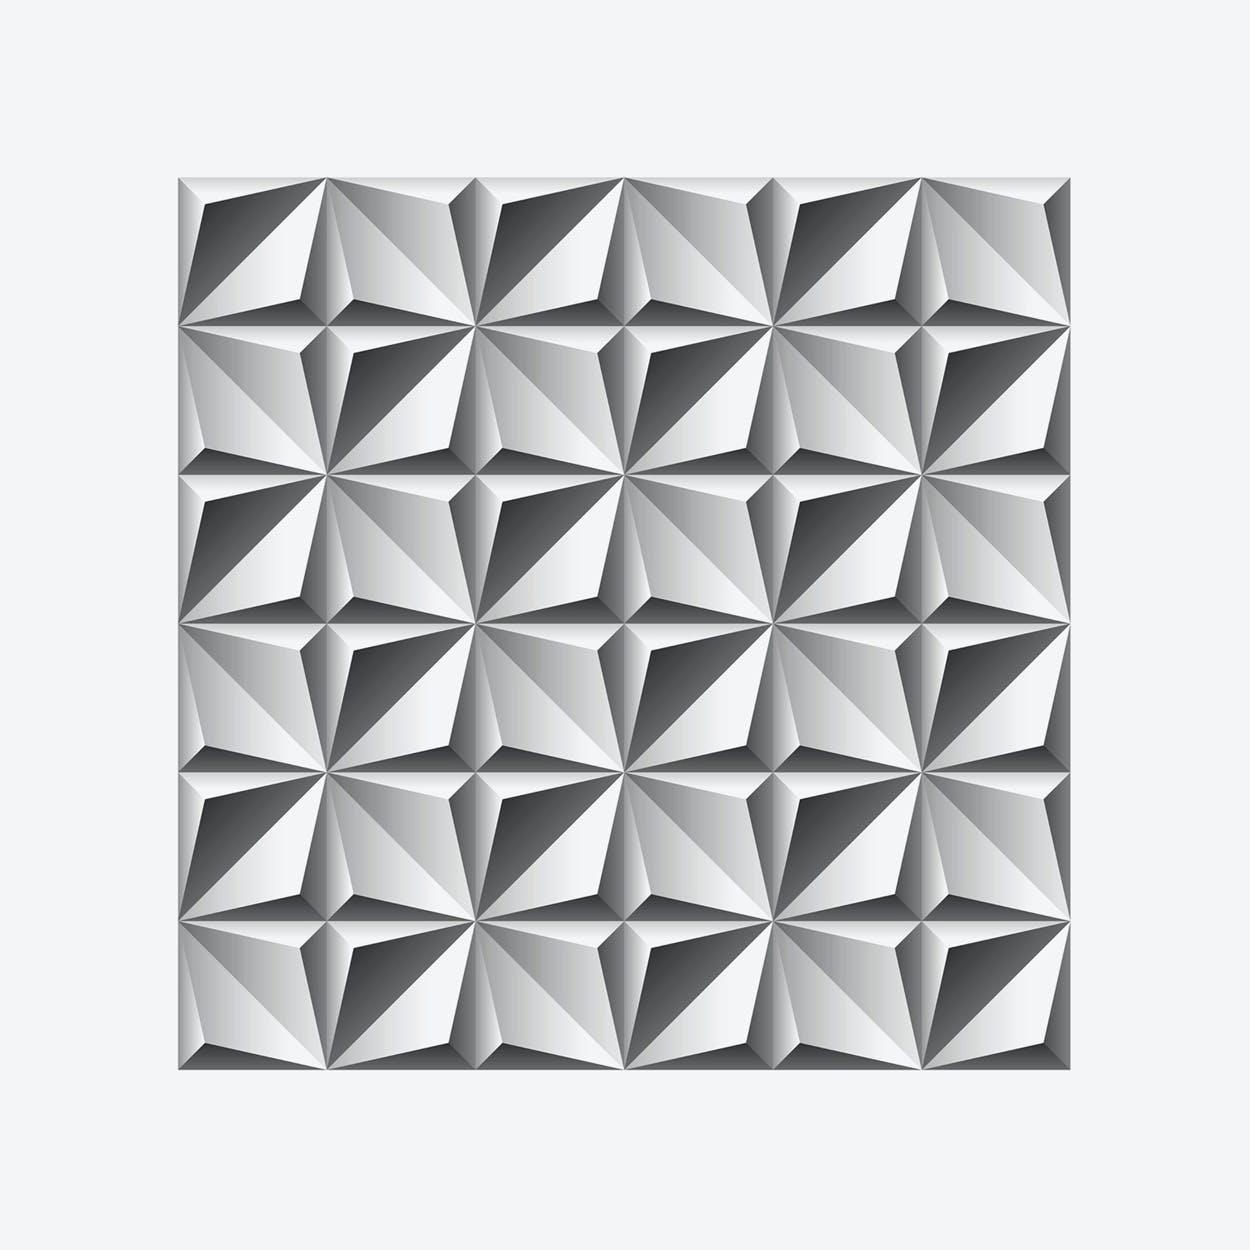 3D Northern Star Self-adhesive Wall Mural